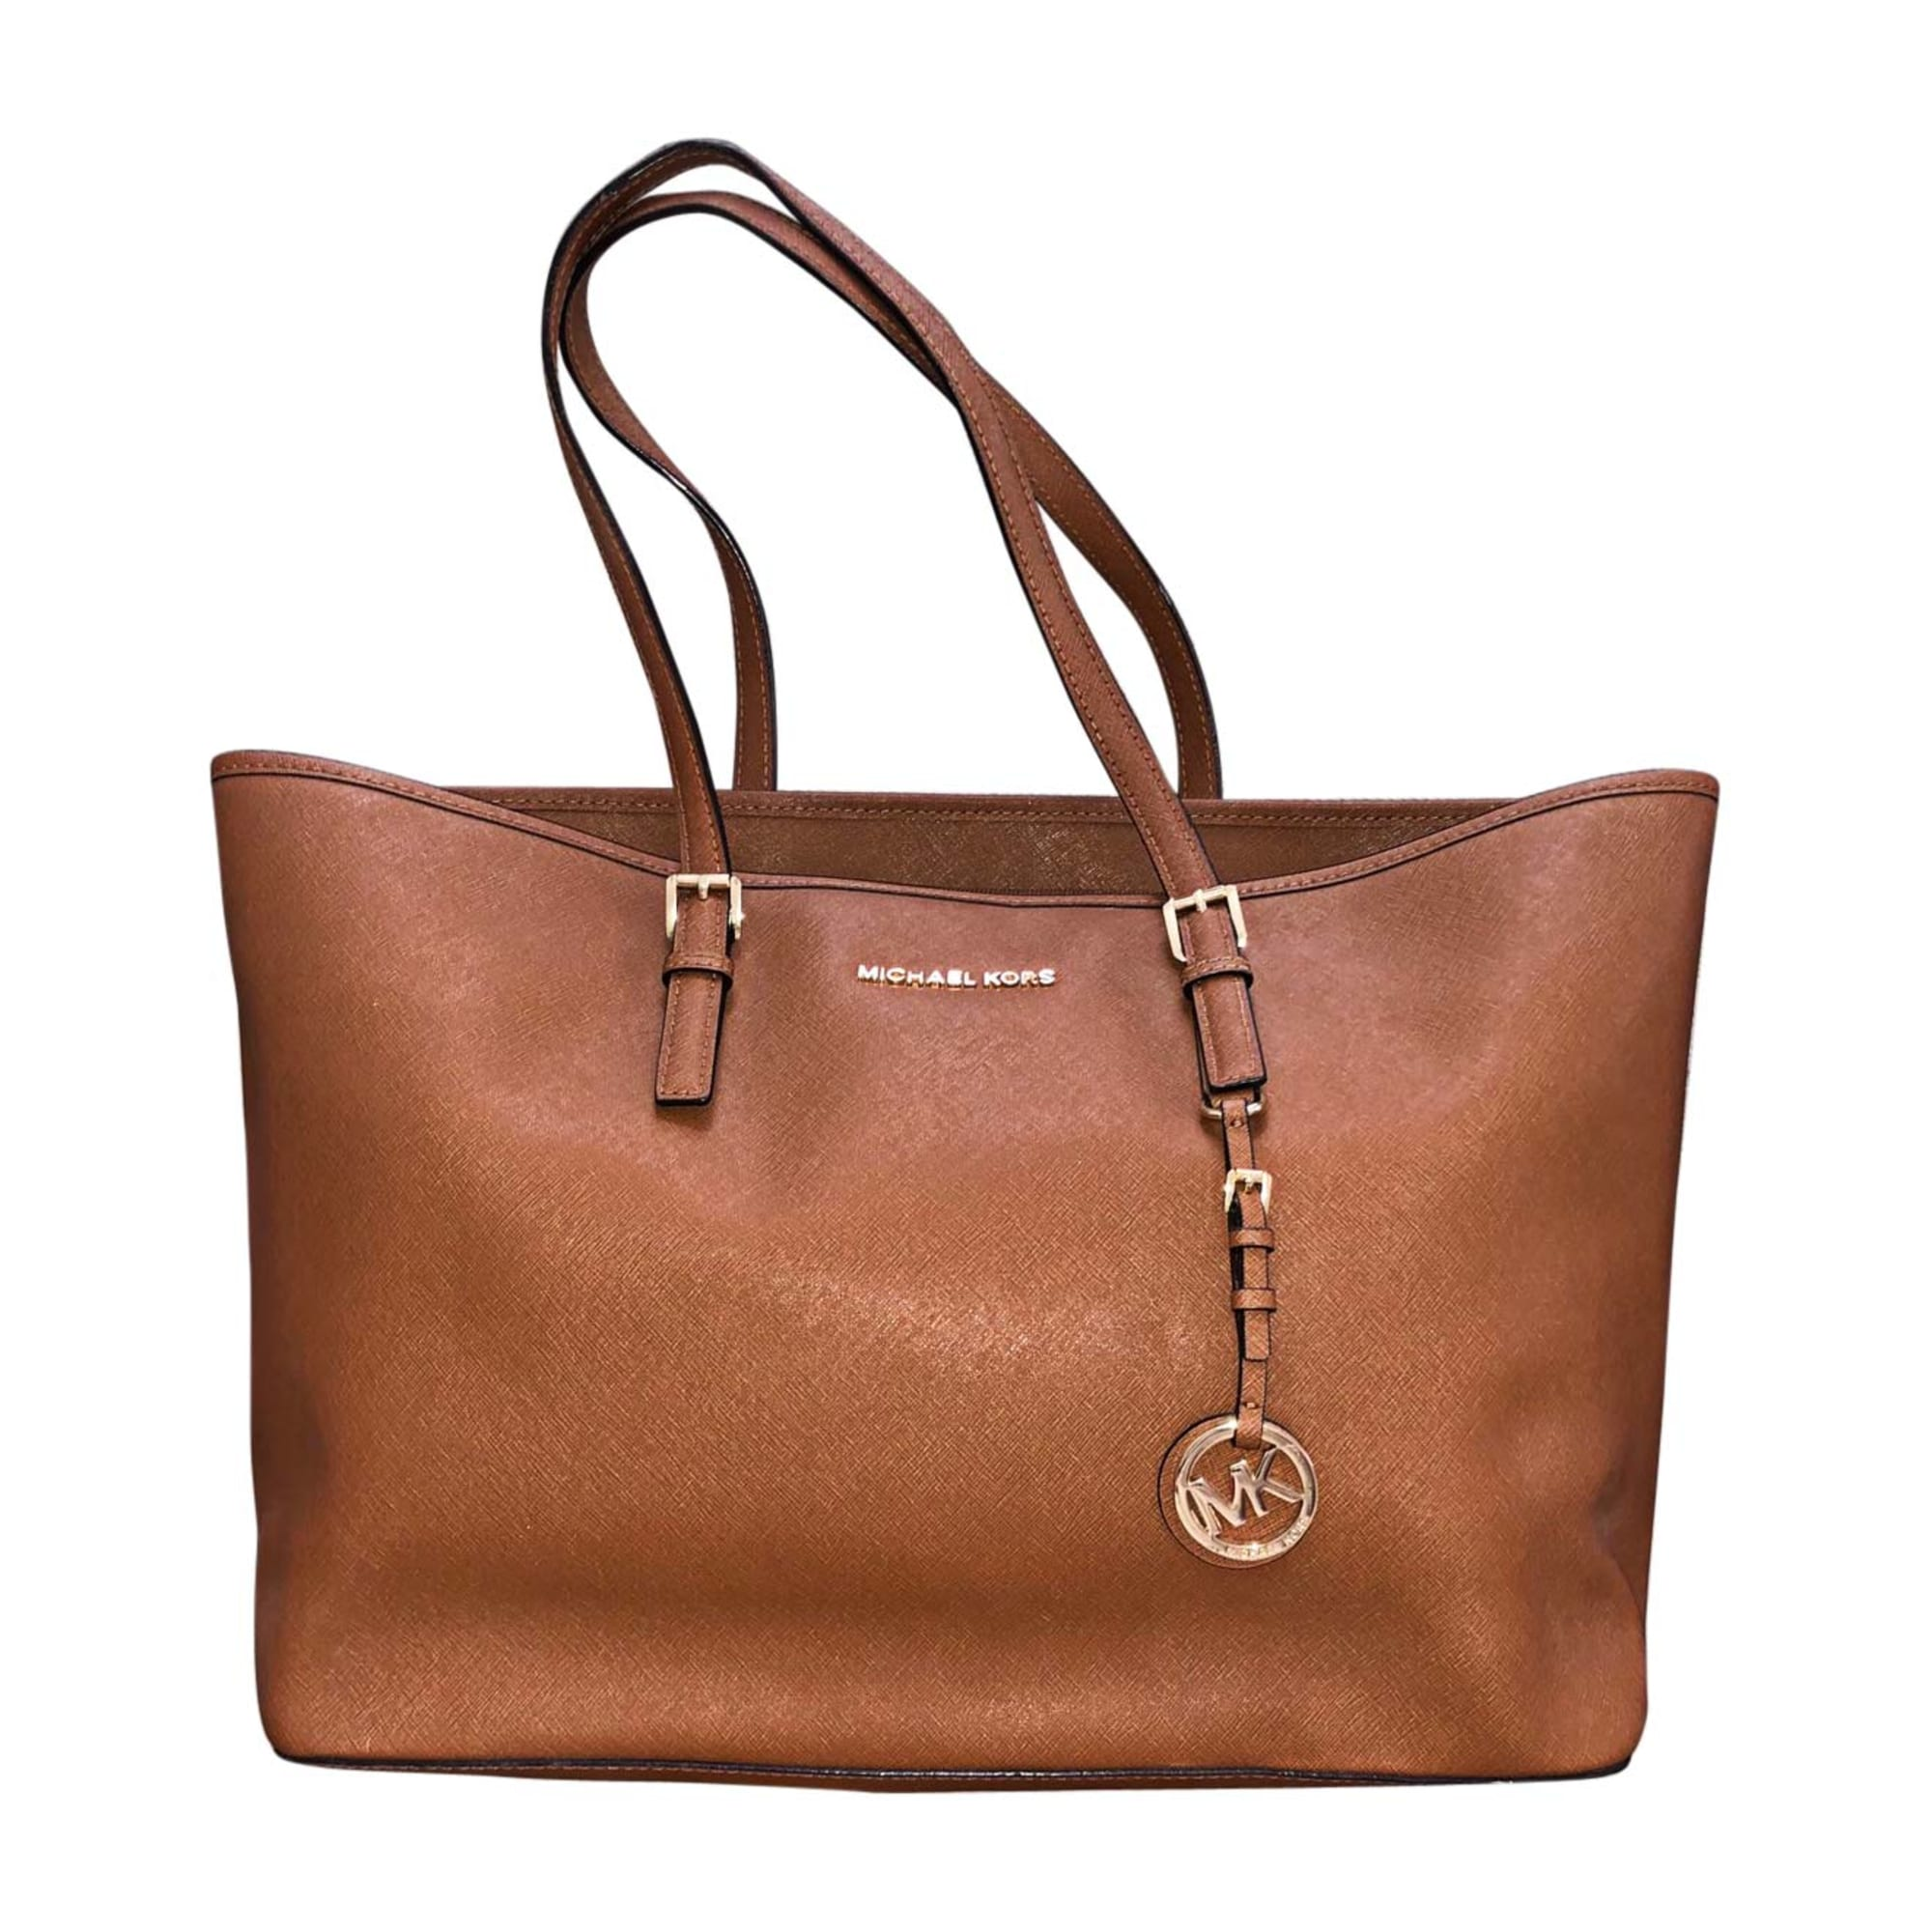 3604764887c6 Leather Handbag MICHAEL KORS beige - 8165780